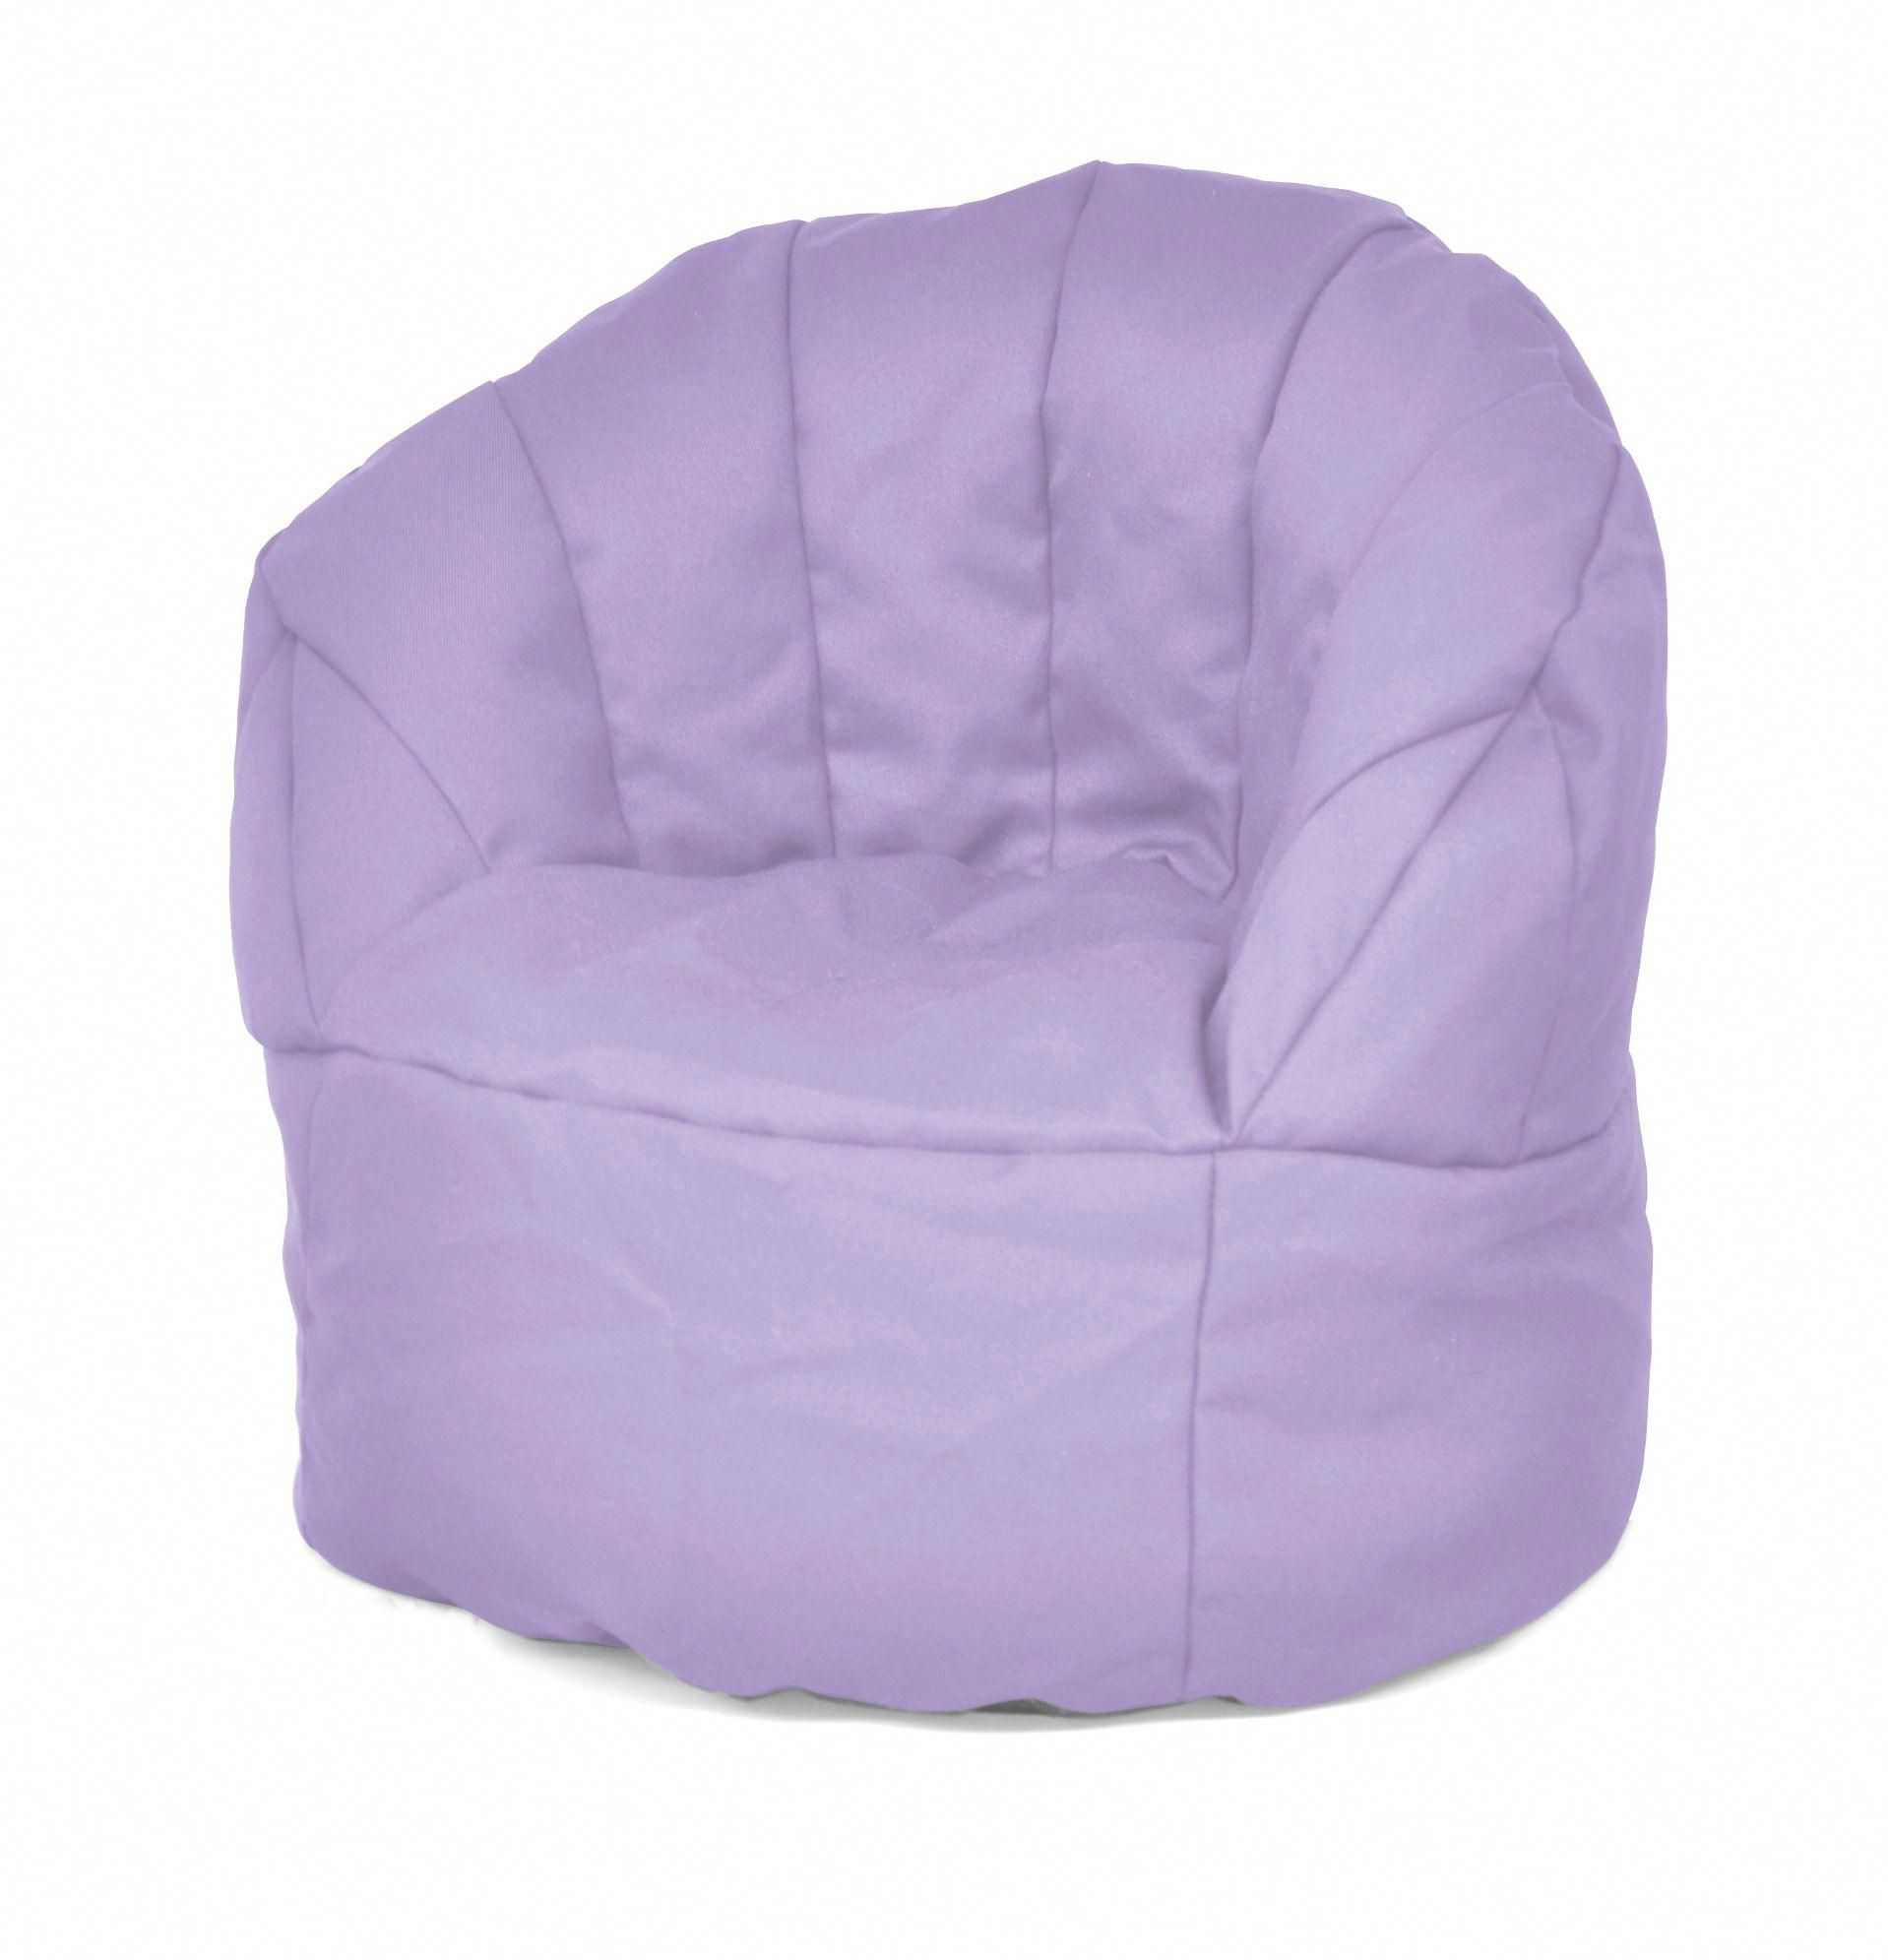 Surprising Crb Kids Solid Bean Bag Chair Medieval Blue Theyellowbook Wood Chair Design Ideas Theyellowbookinfo